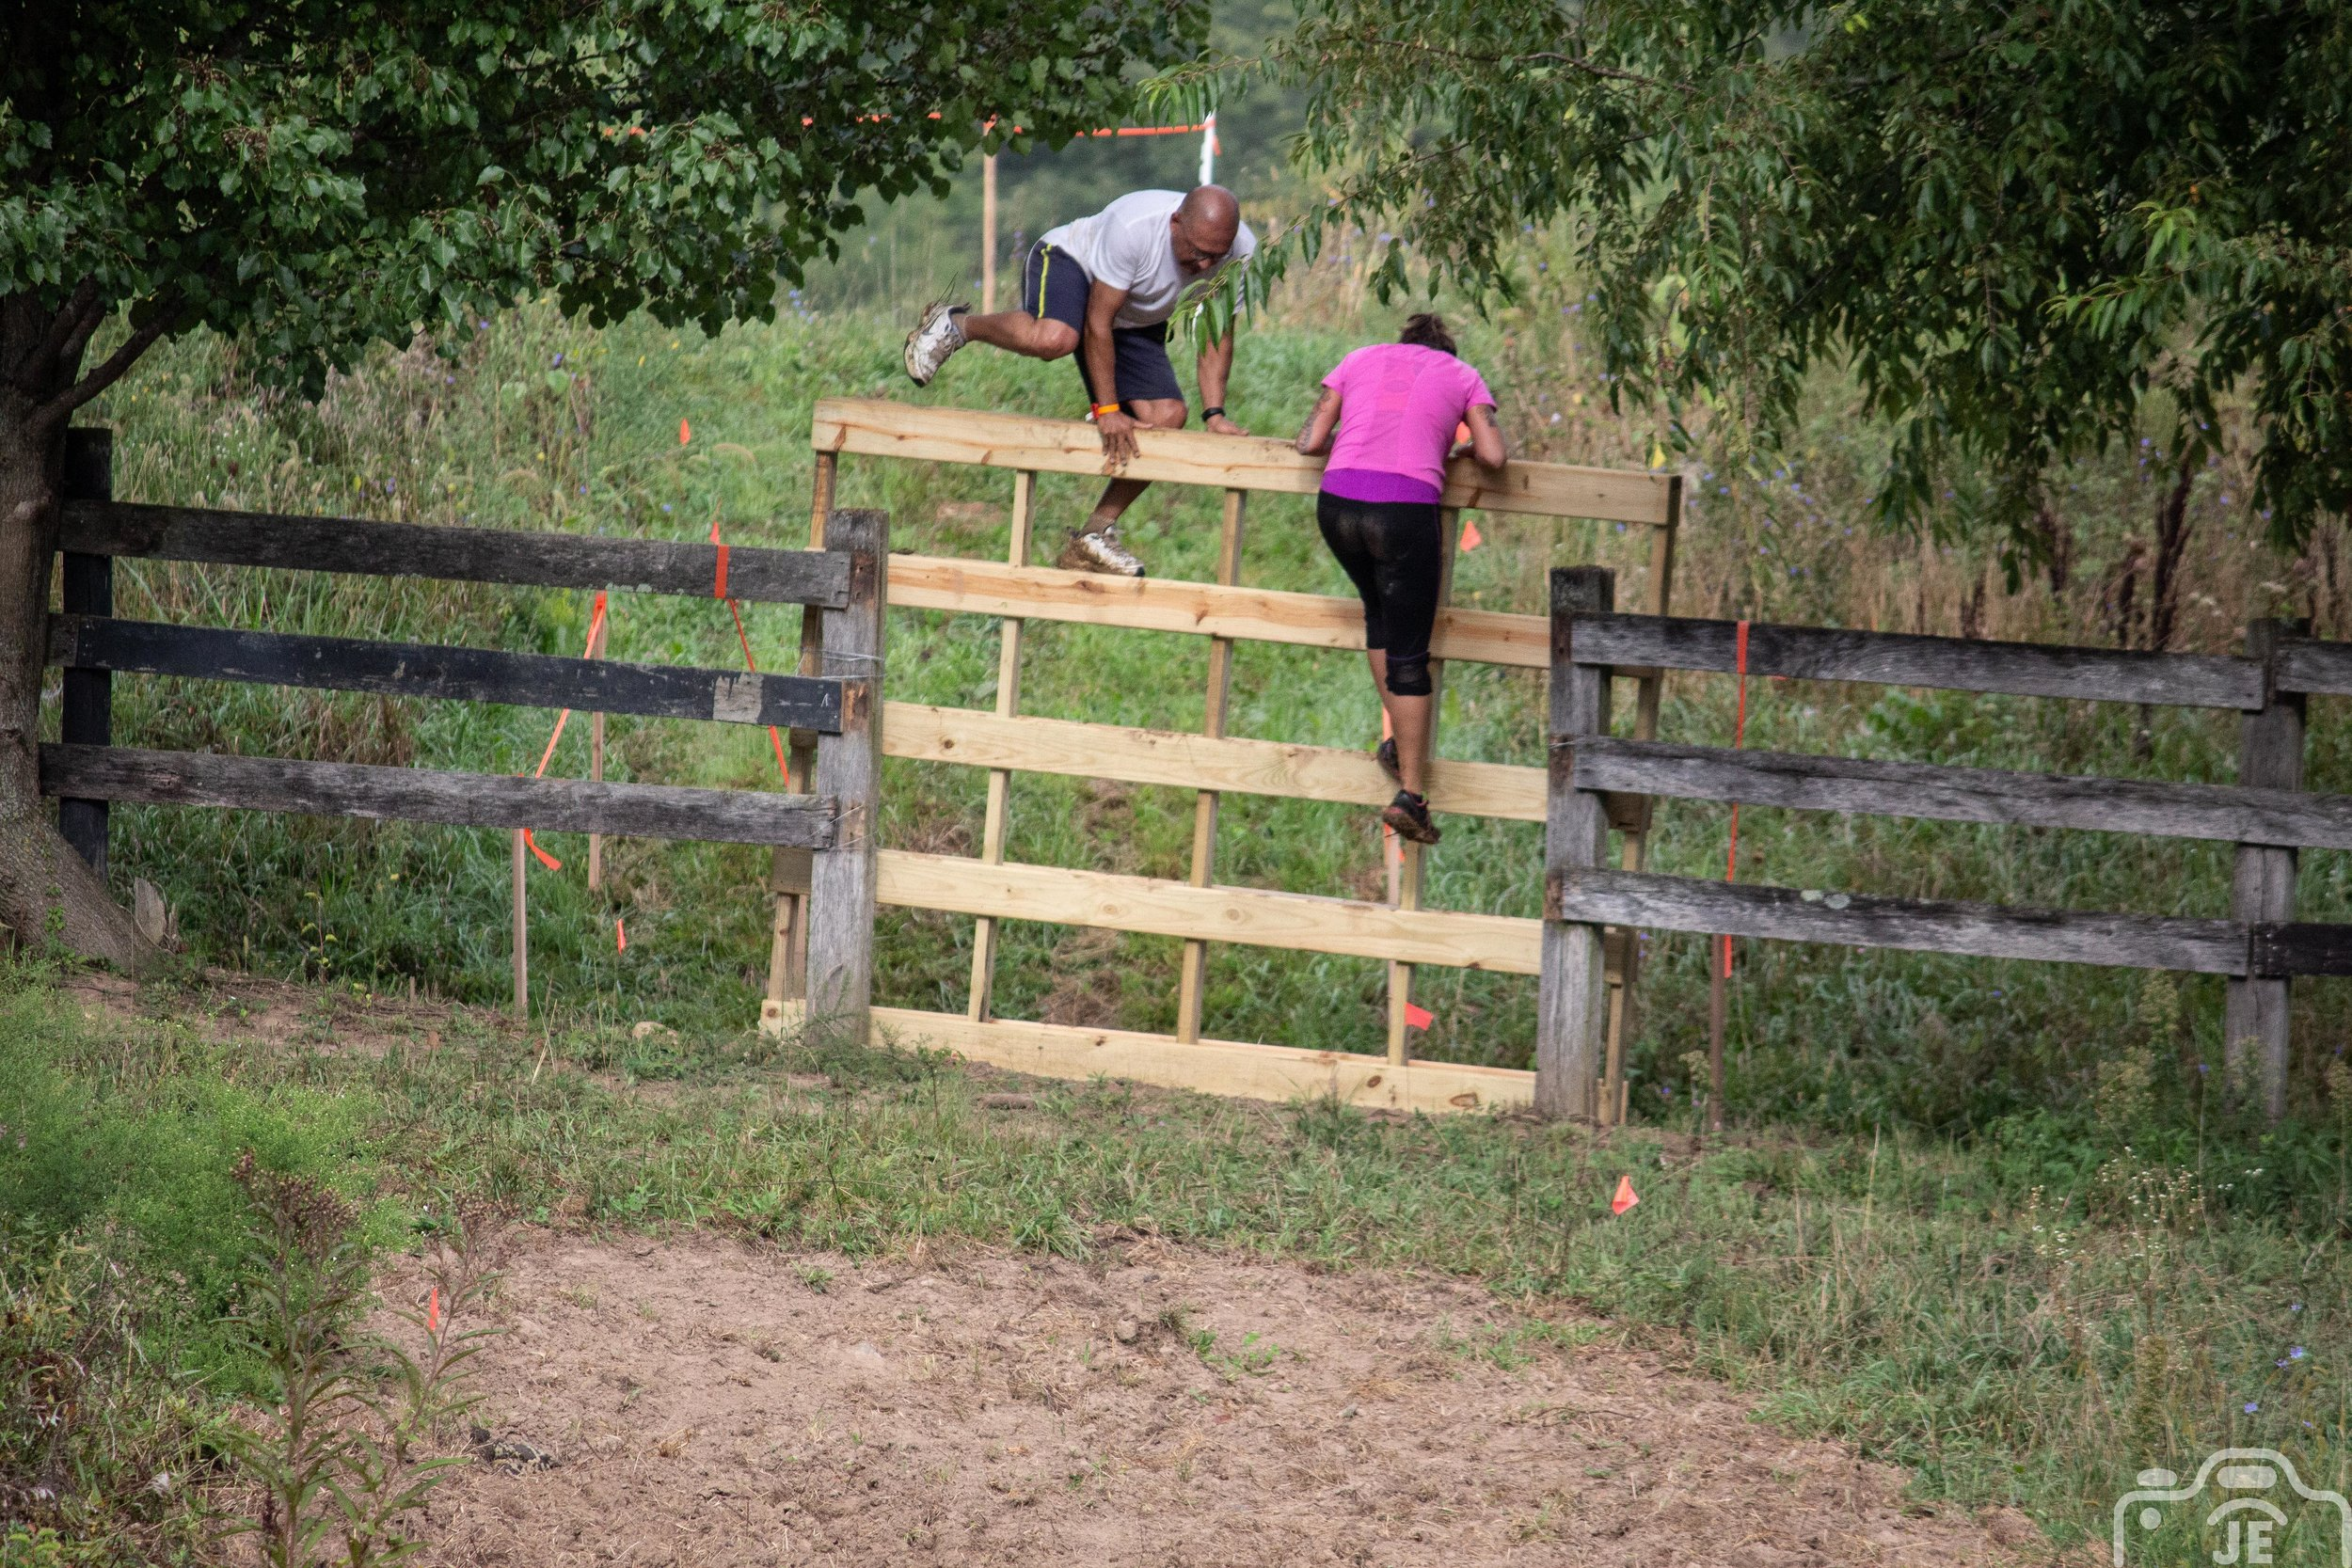 fence climb.jpg